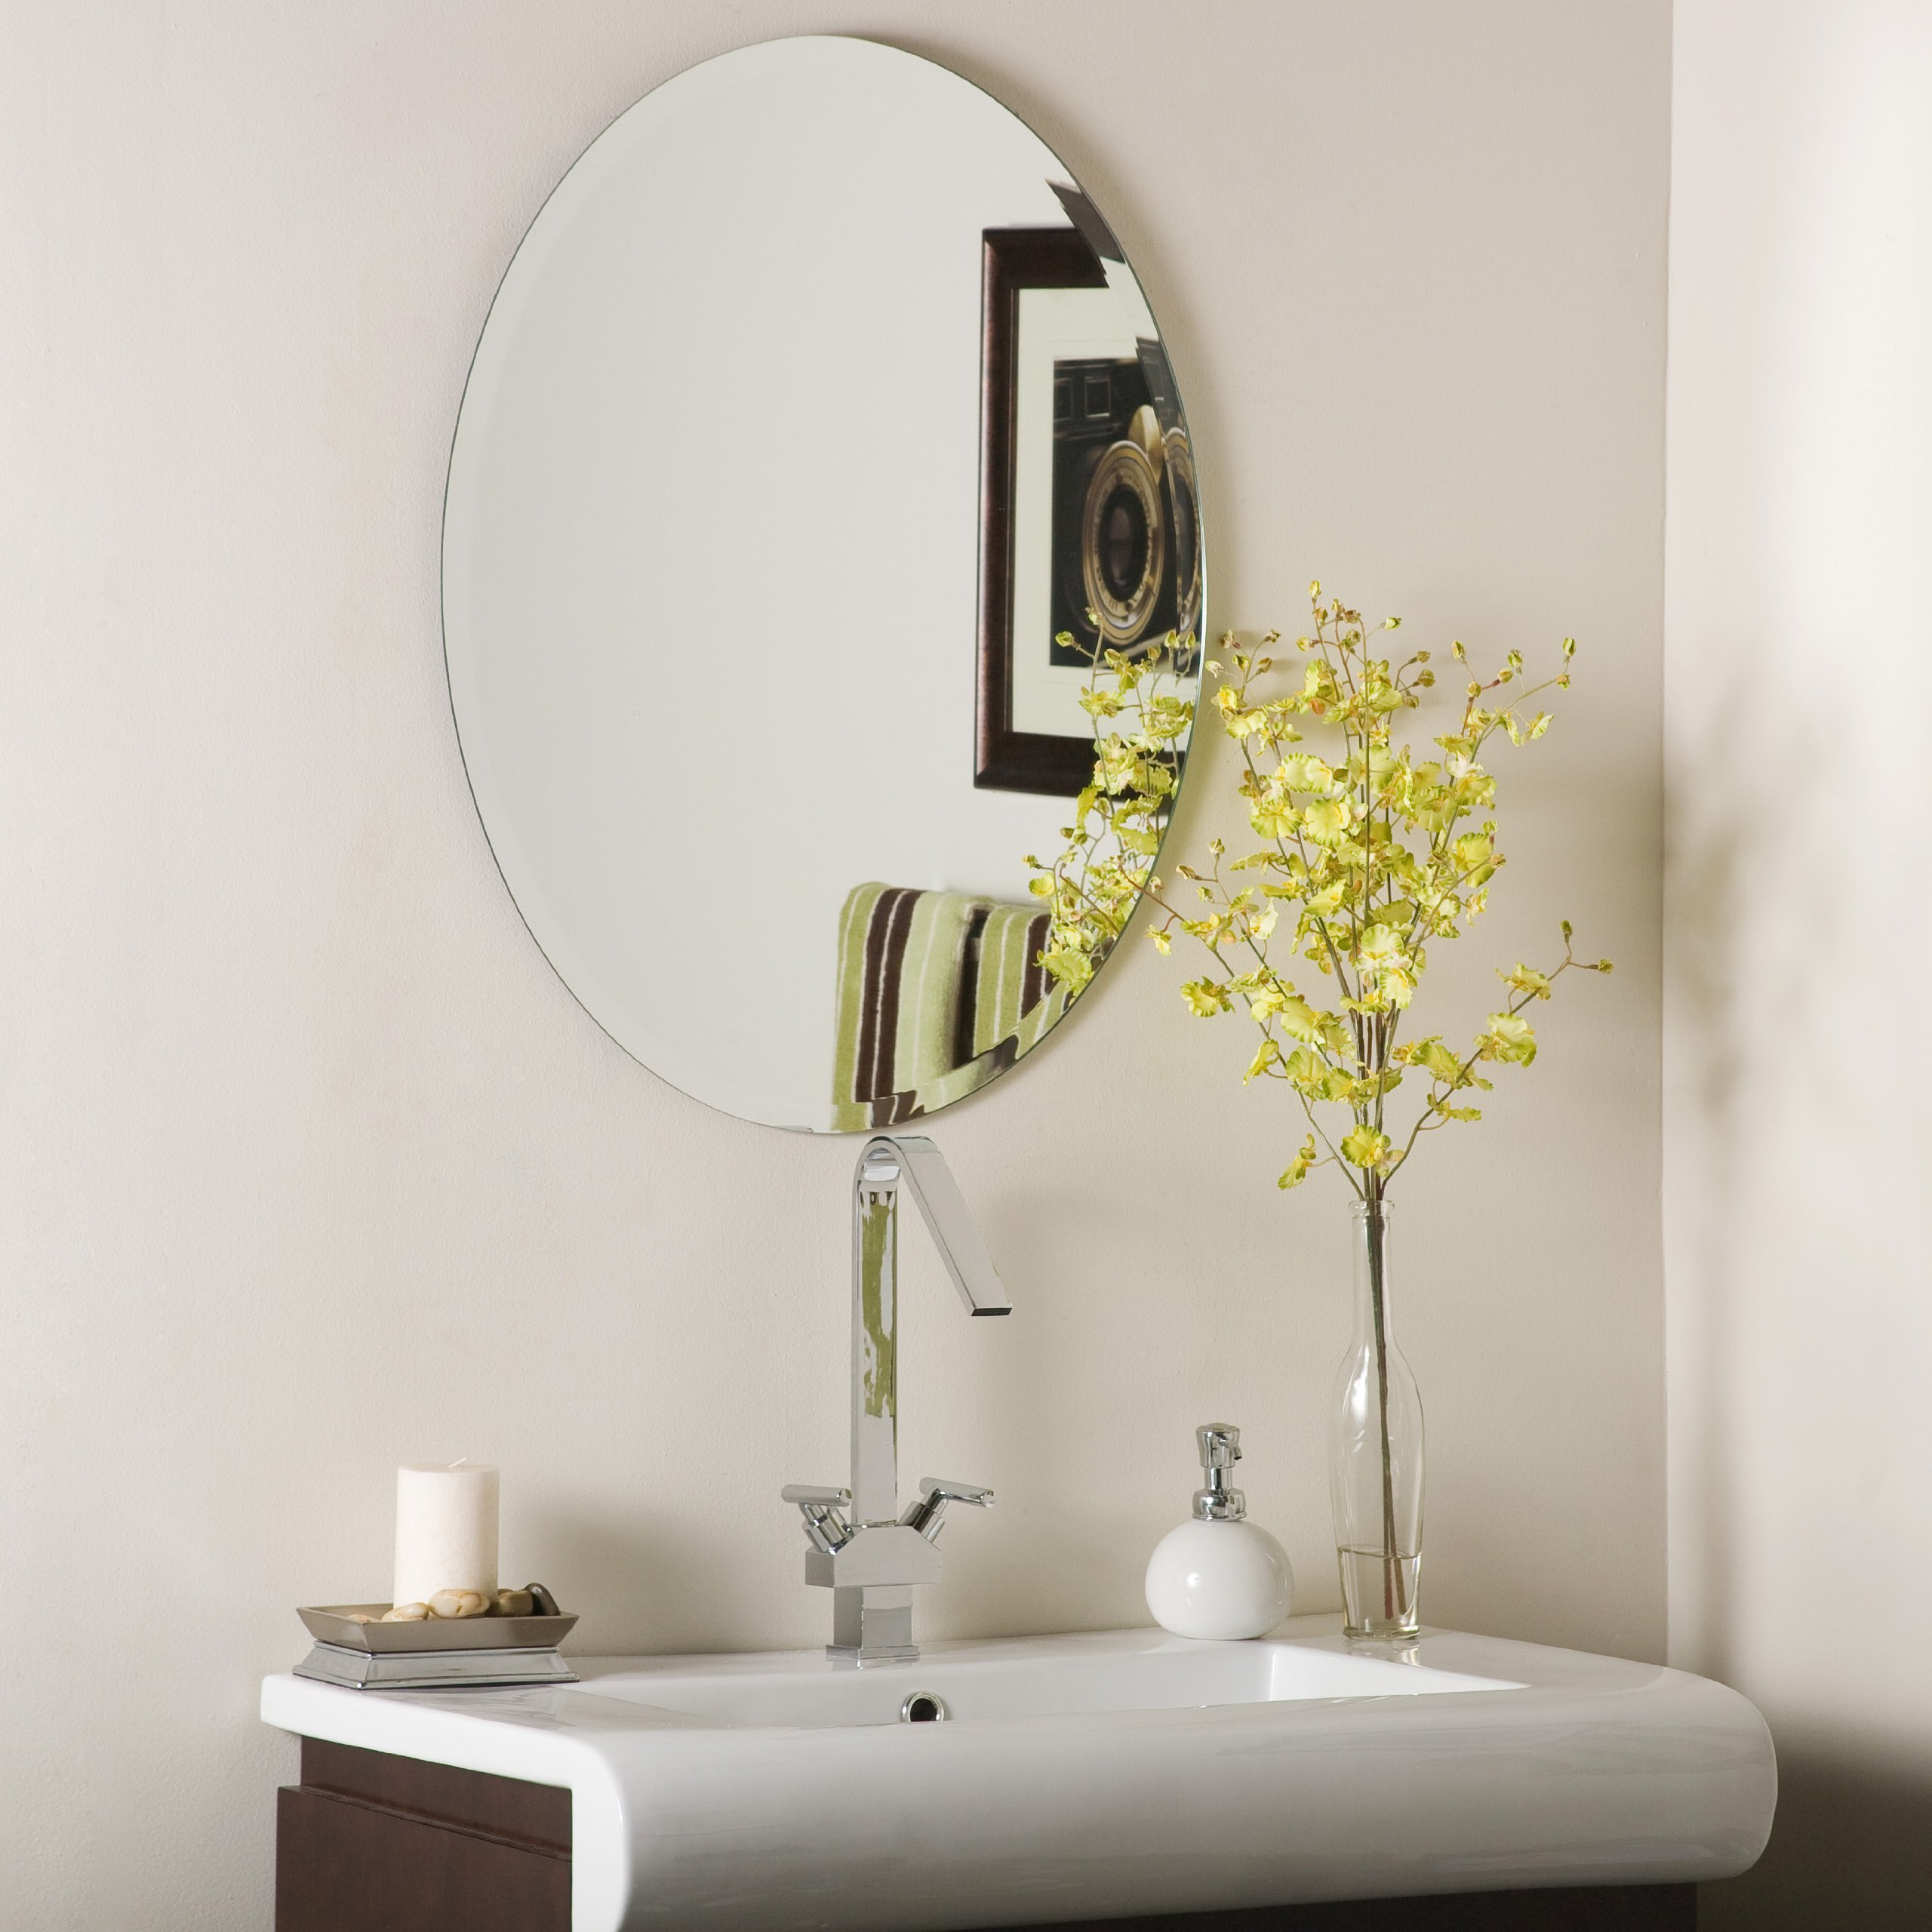 Oval Bevel Frameless Wall Mirror